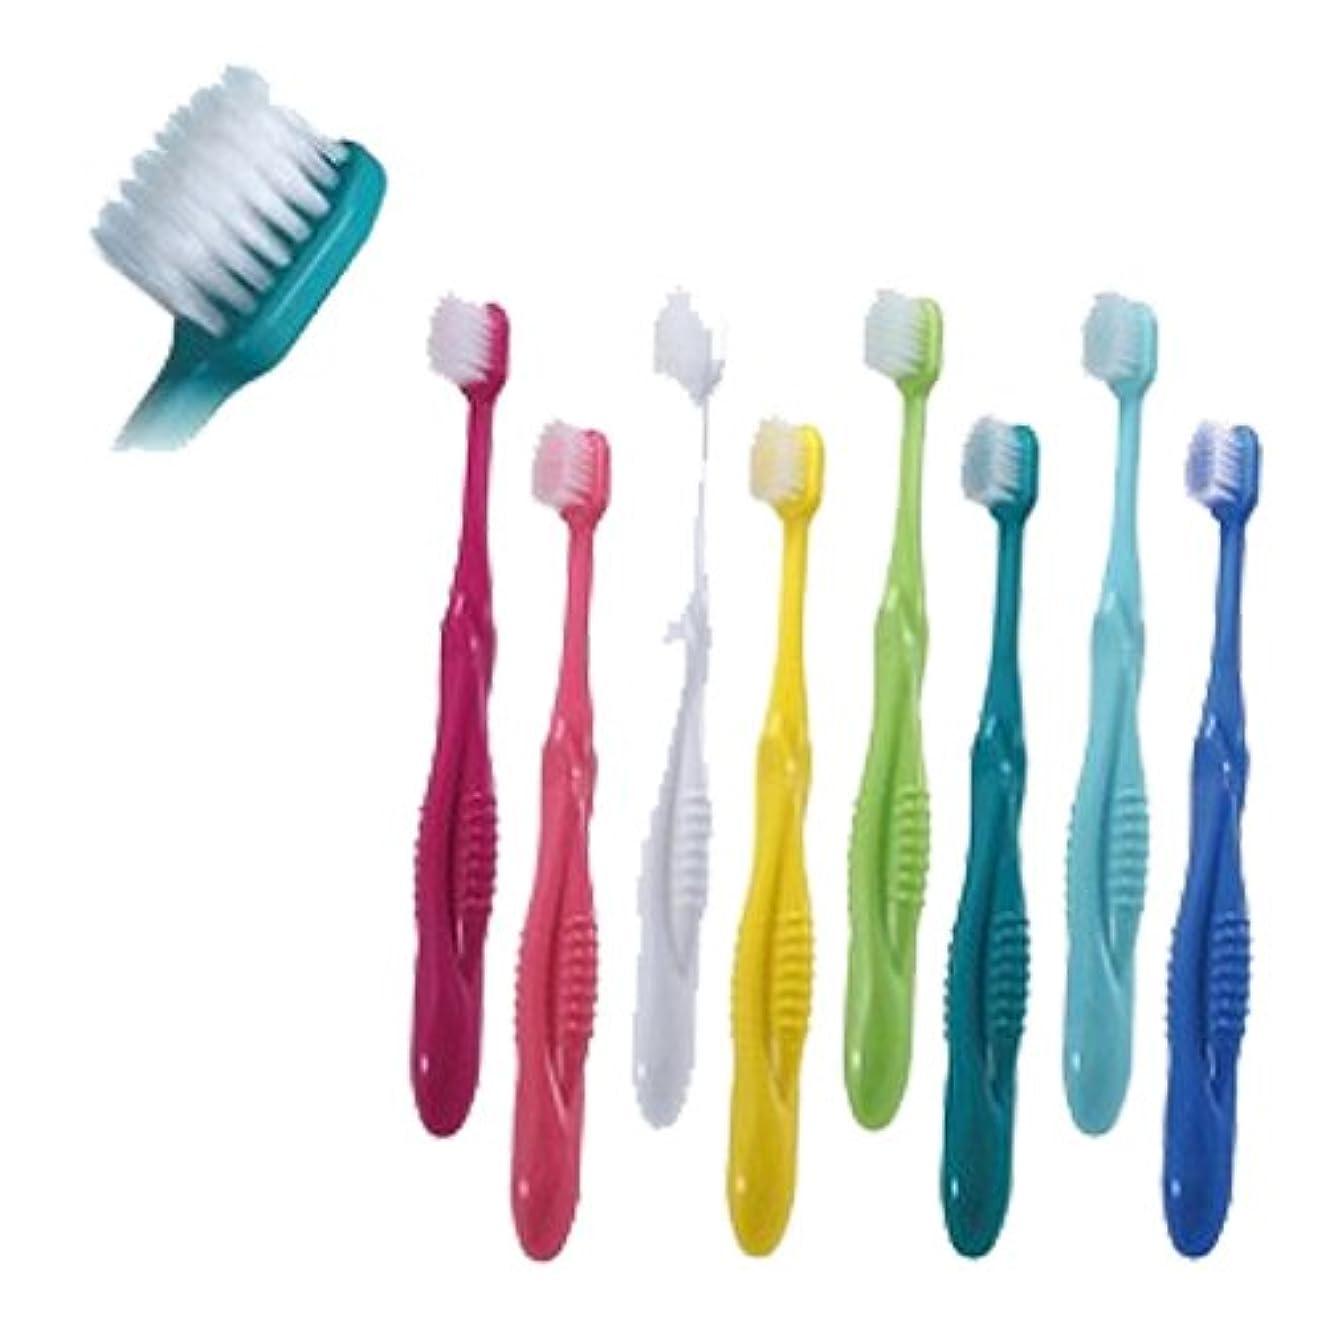 Ciメディカル 歯ブラシ Ci802#M(ラウンド毛タイプ)×1本